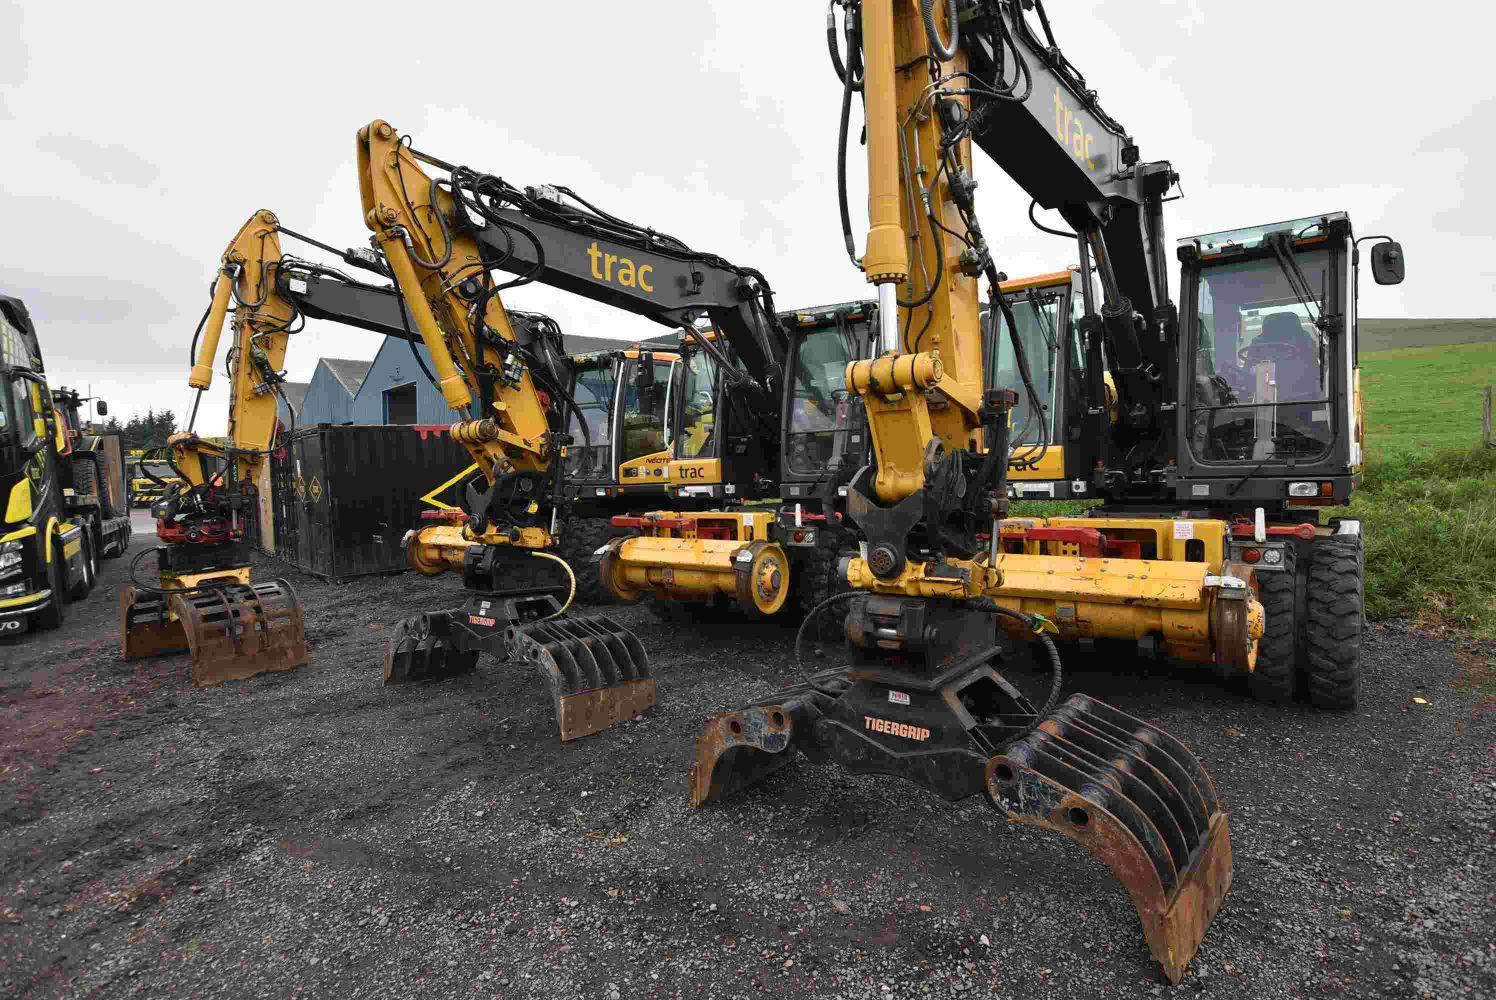 Major Online Auction - Road Rail Vehicles (w6a gauge), Rail Infrastructure, Maintenance Contractors Plant and Equipment